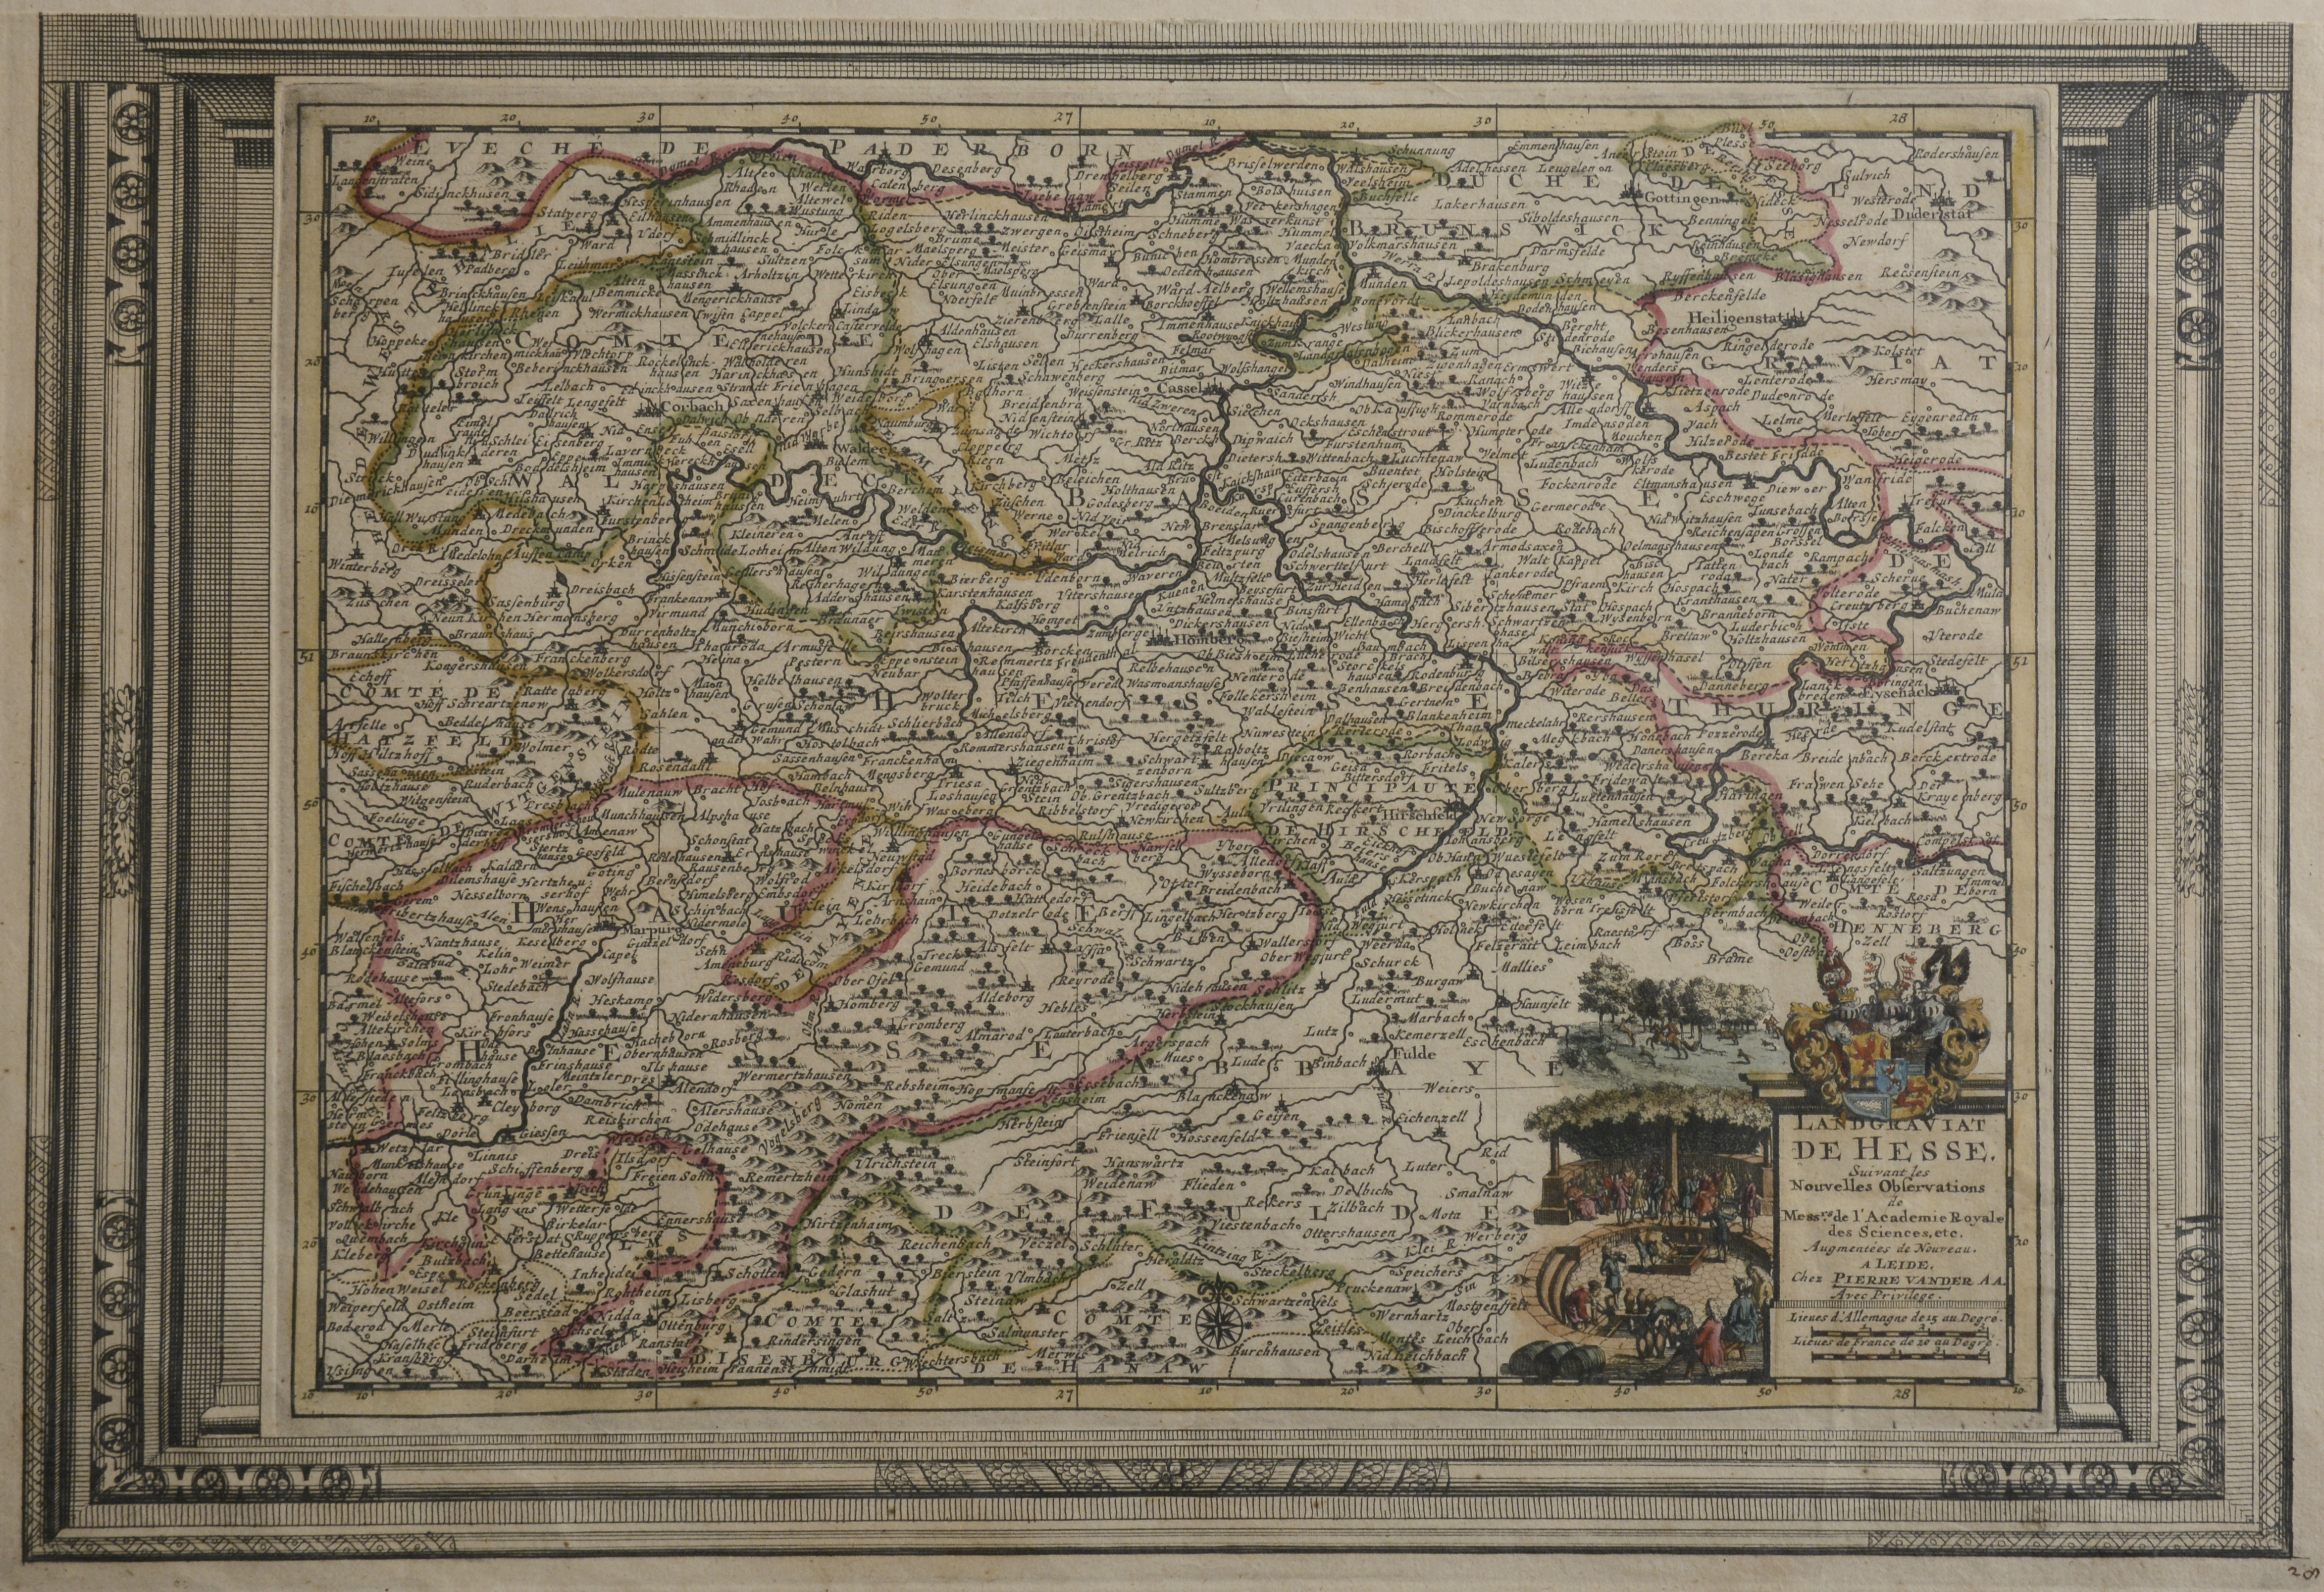 Landgraviat de Hesse. Karte des Gebietes zwischen: NORDHESSEN -